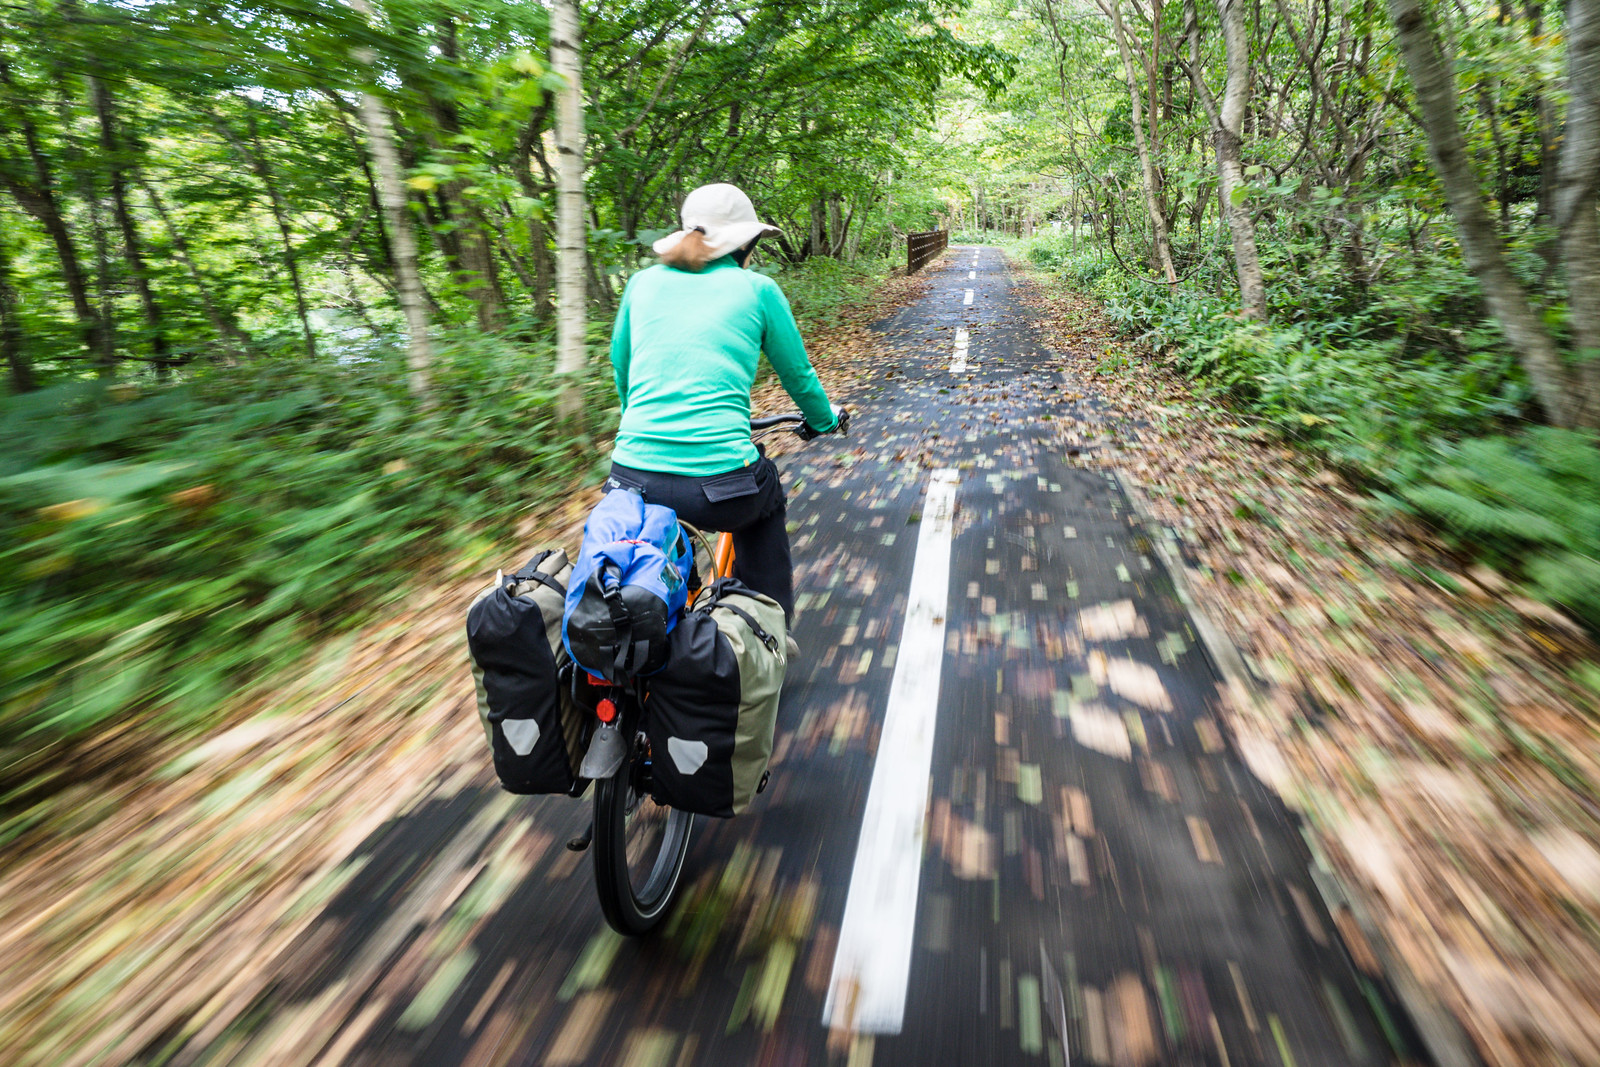 Cycling from Chitose City to Lake Shikotsu, Hokkaido, Japan